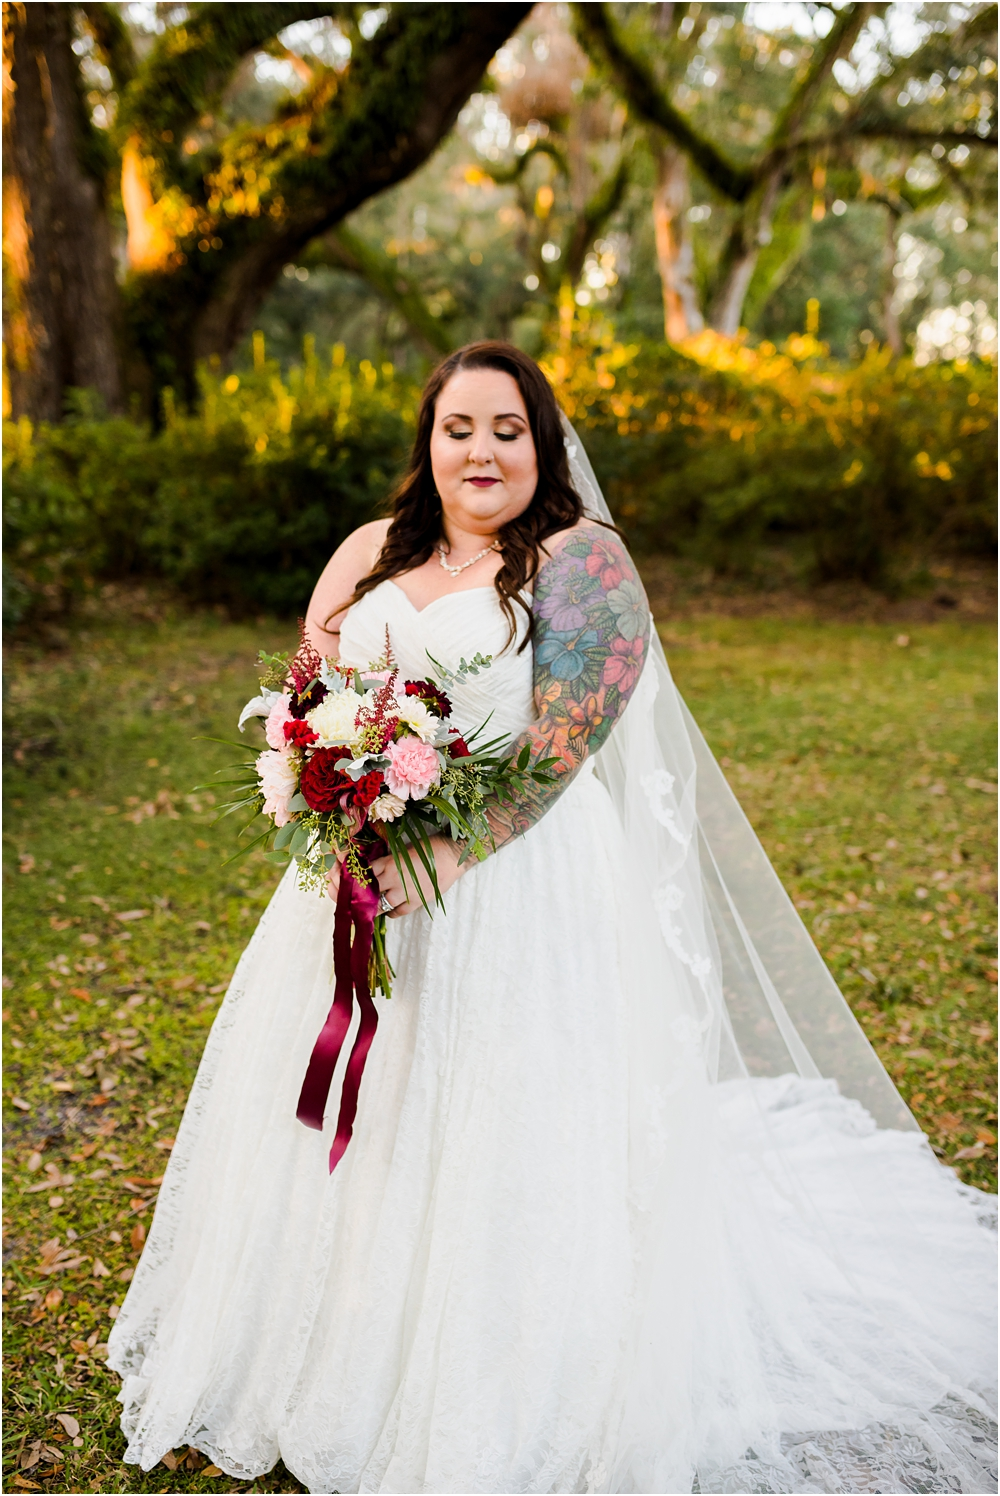 Eden-Gardens-florida-wedding-photographer-kiersten-stevenson-photography-99.jpg